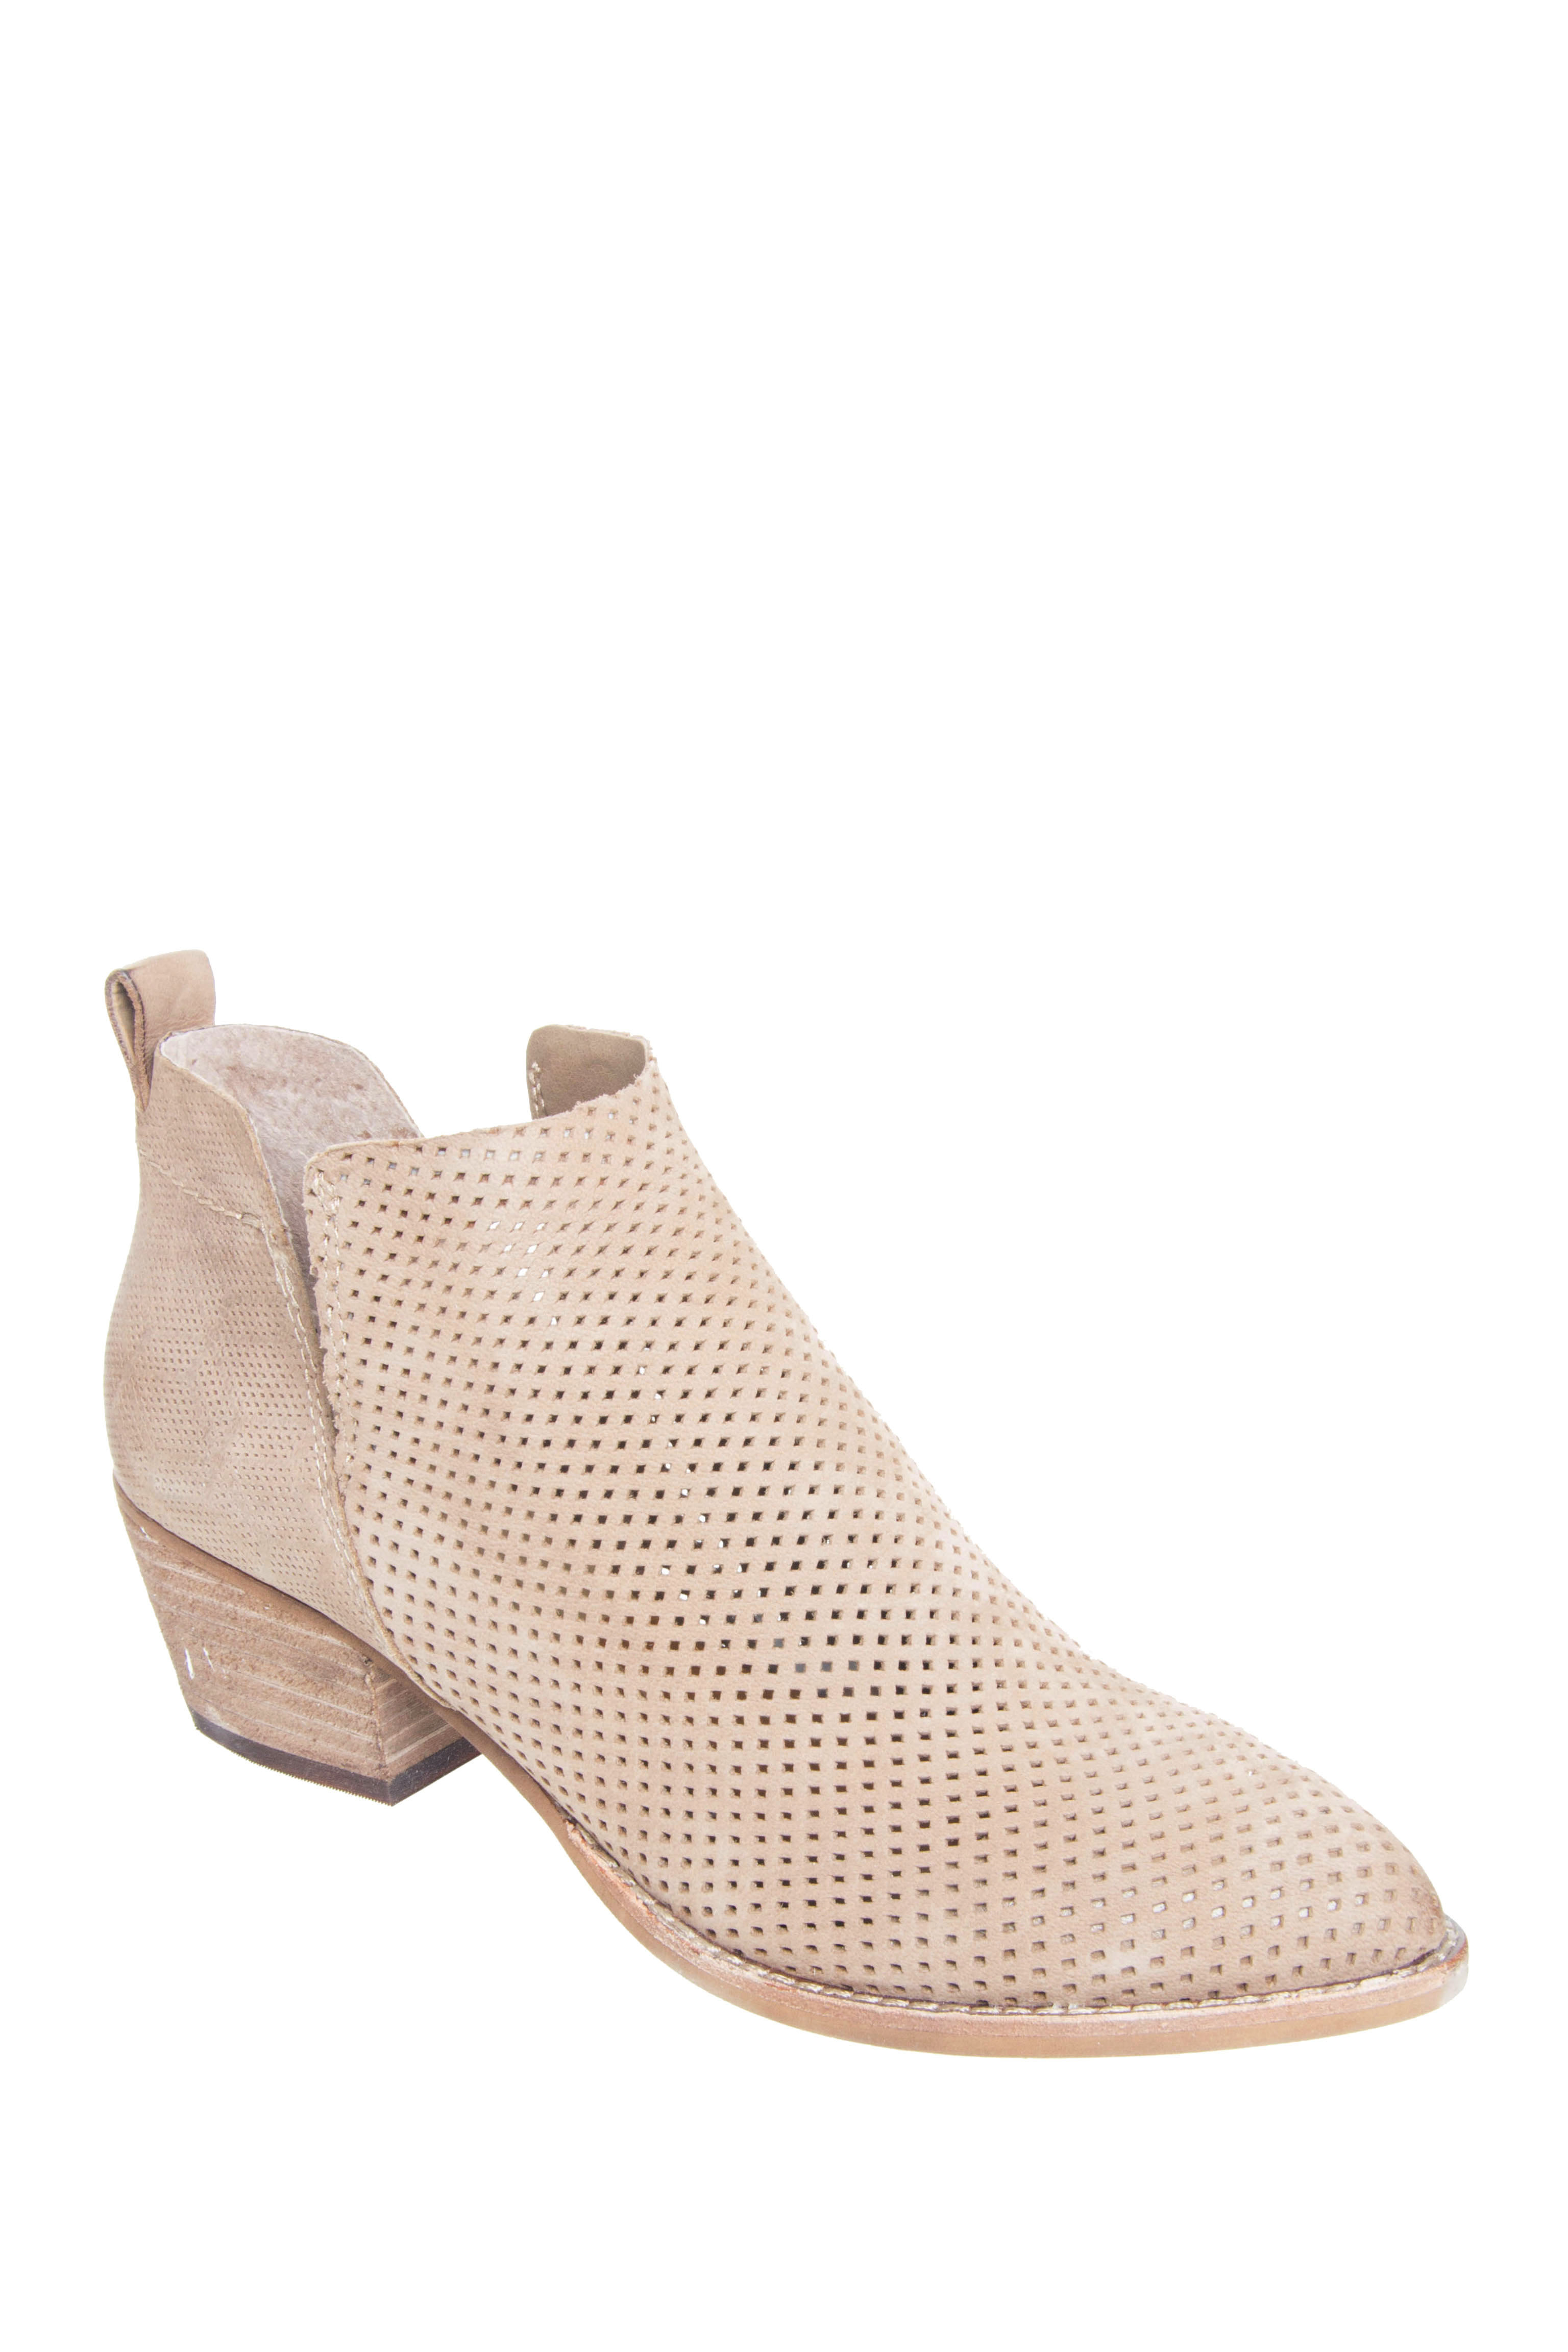 Dolce Vita Sonya Mid Heel Booties - Taupe Nubuck